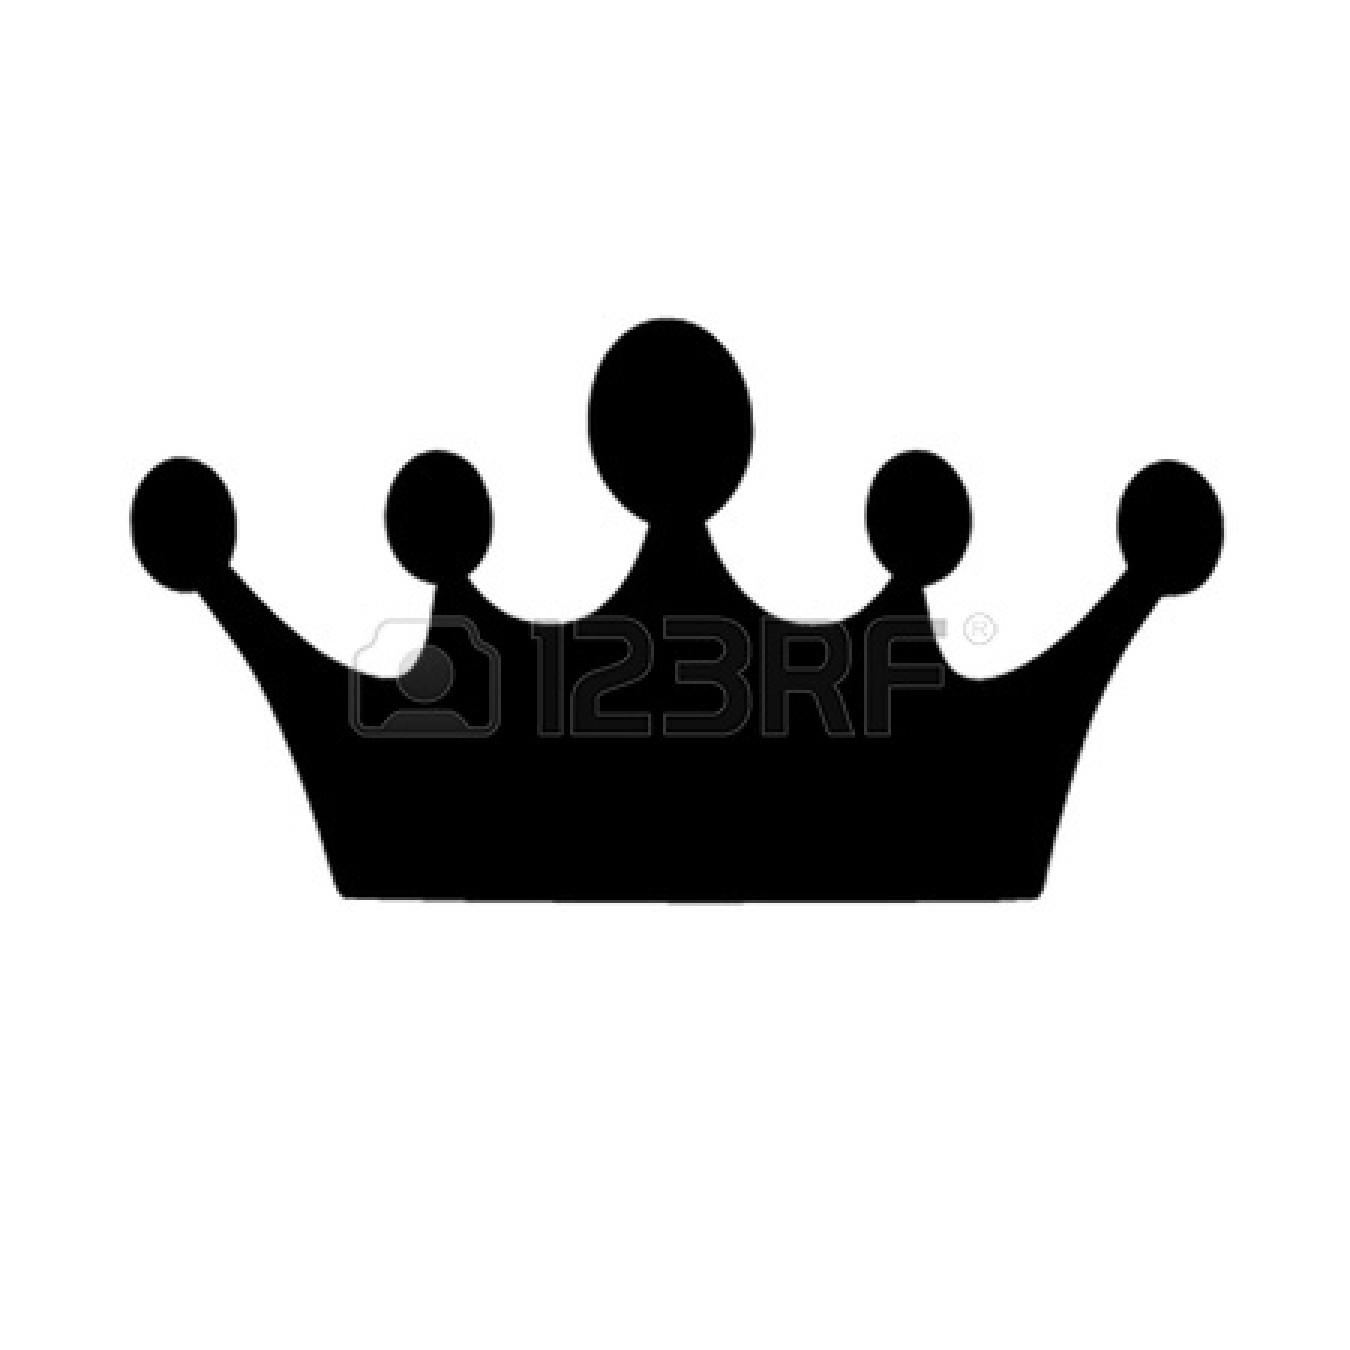 Free Black Crown Transparent Background, Download Free Clip.